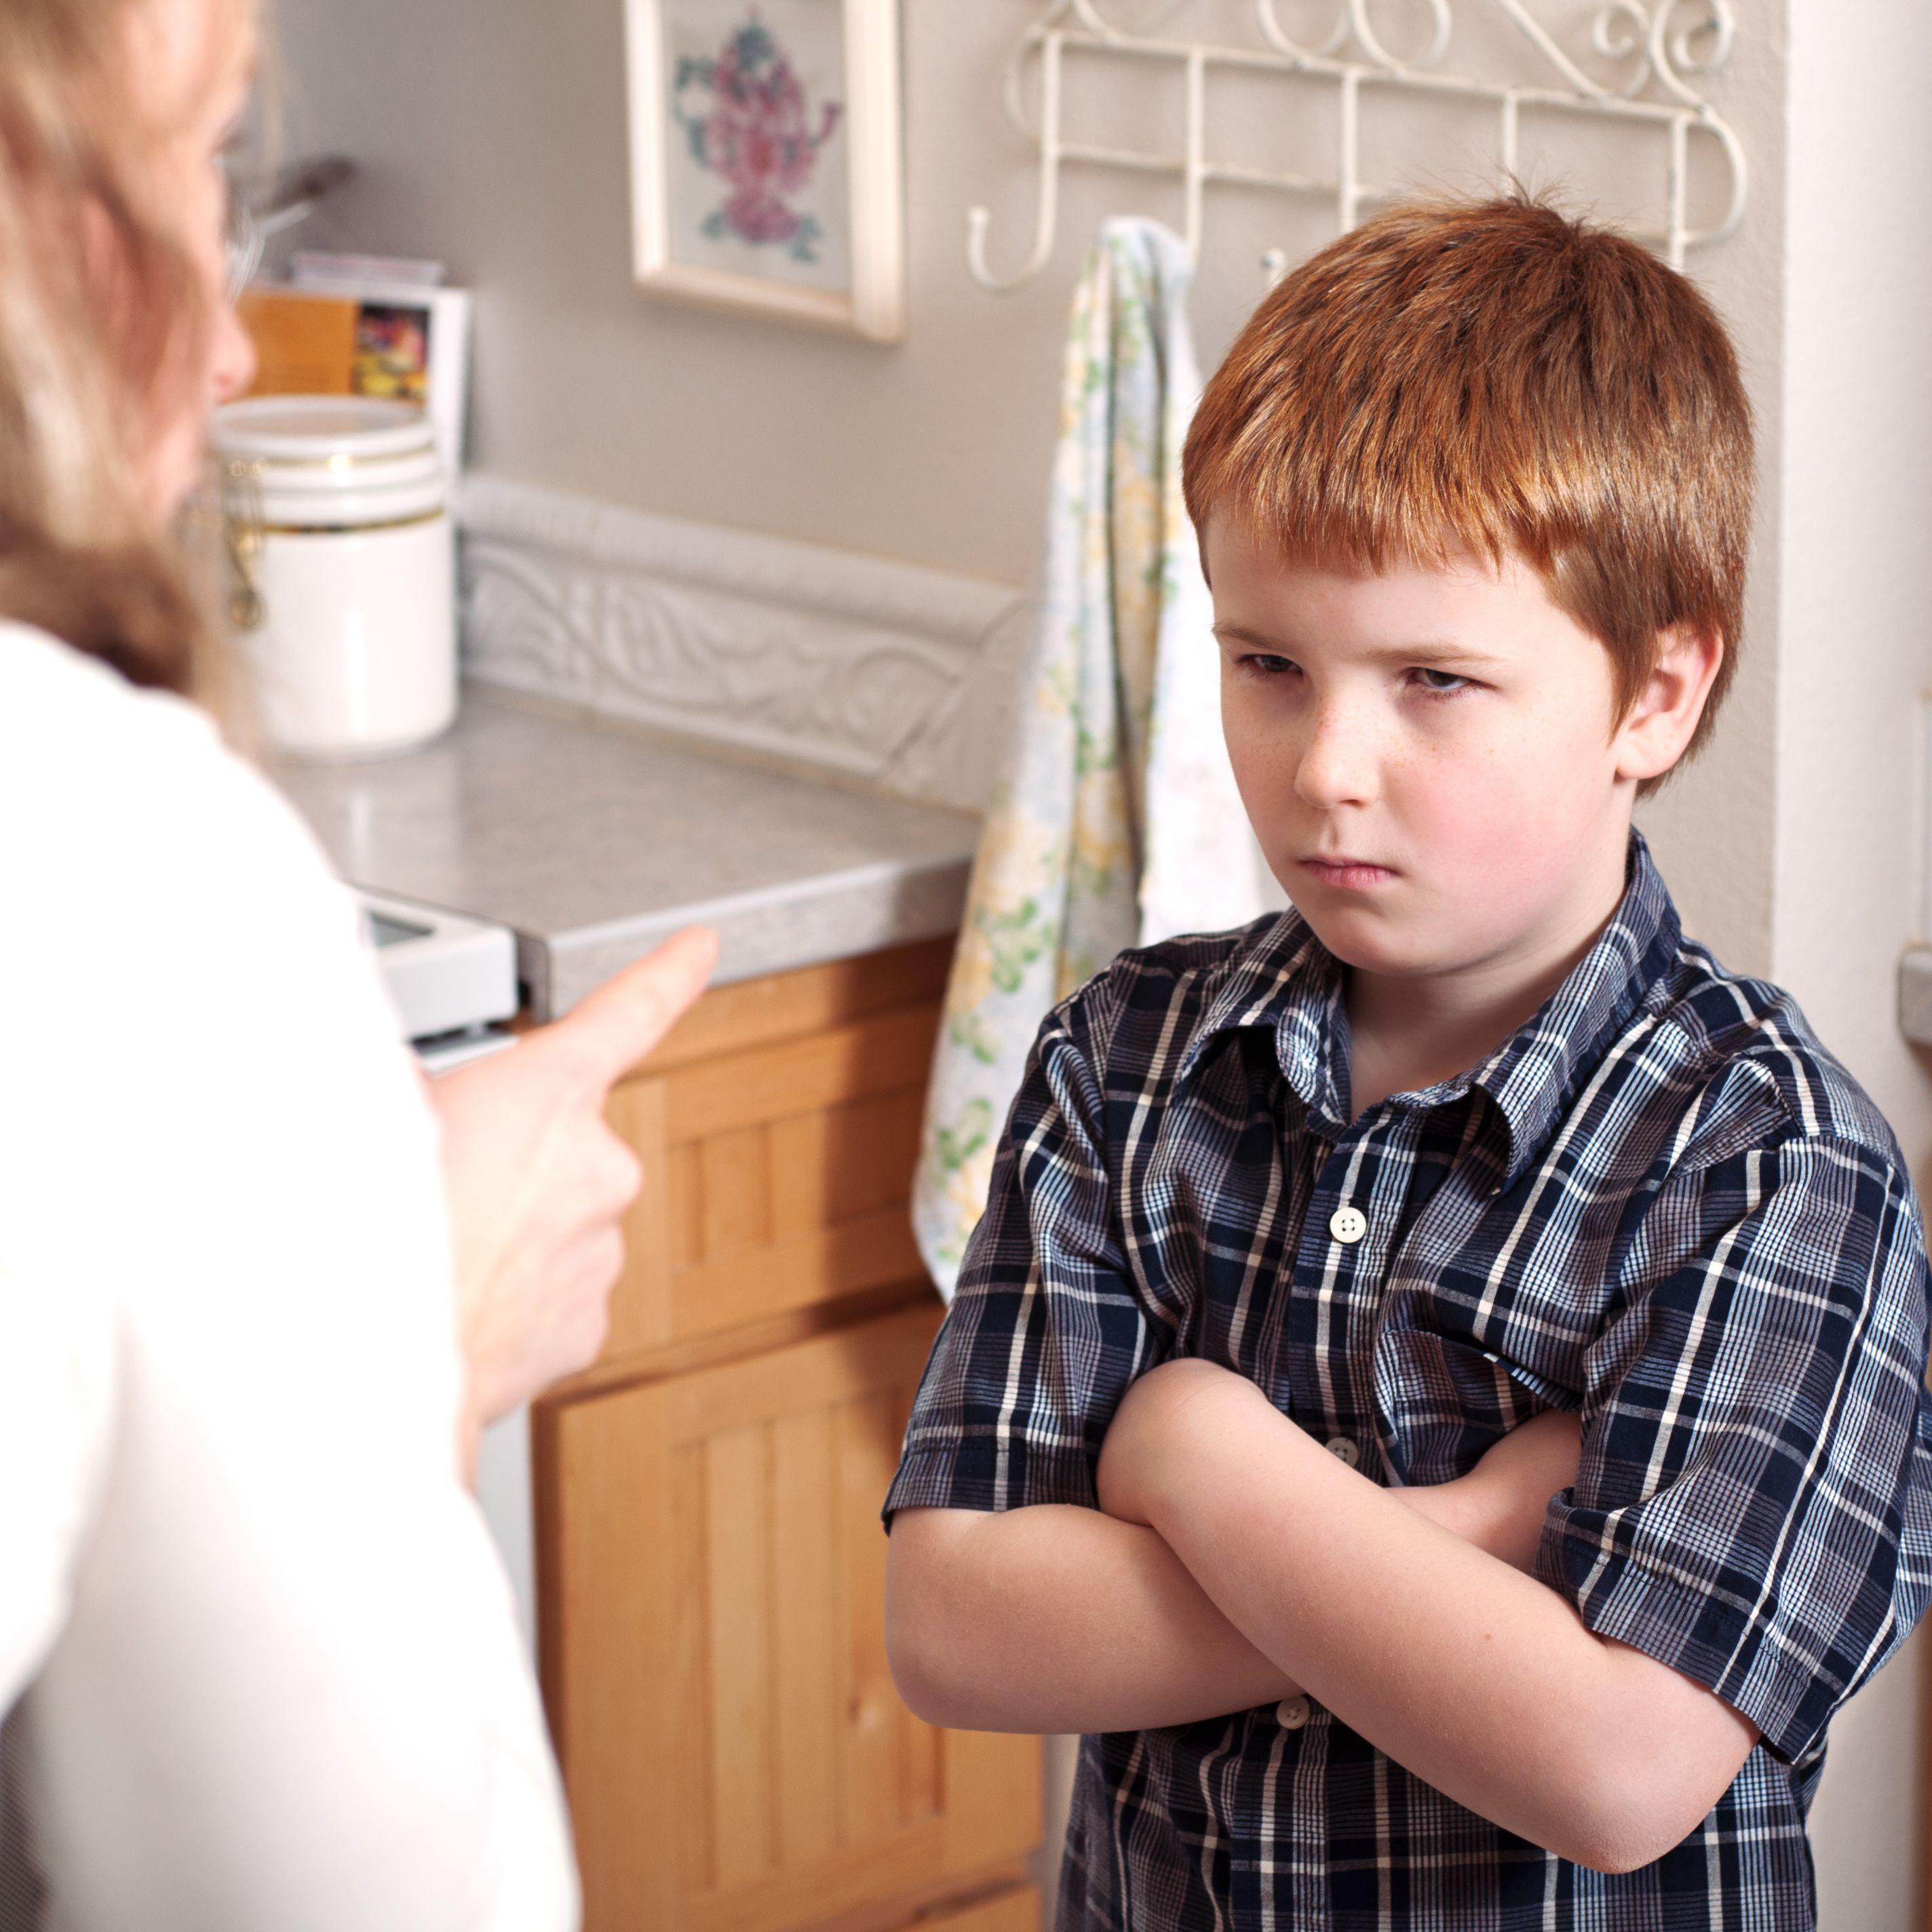 Autistic Behavior vs Misbehavior